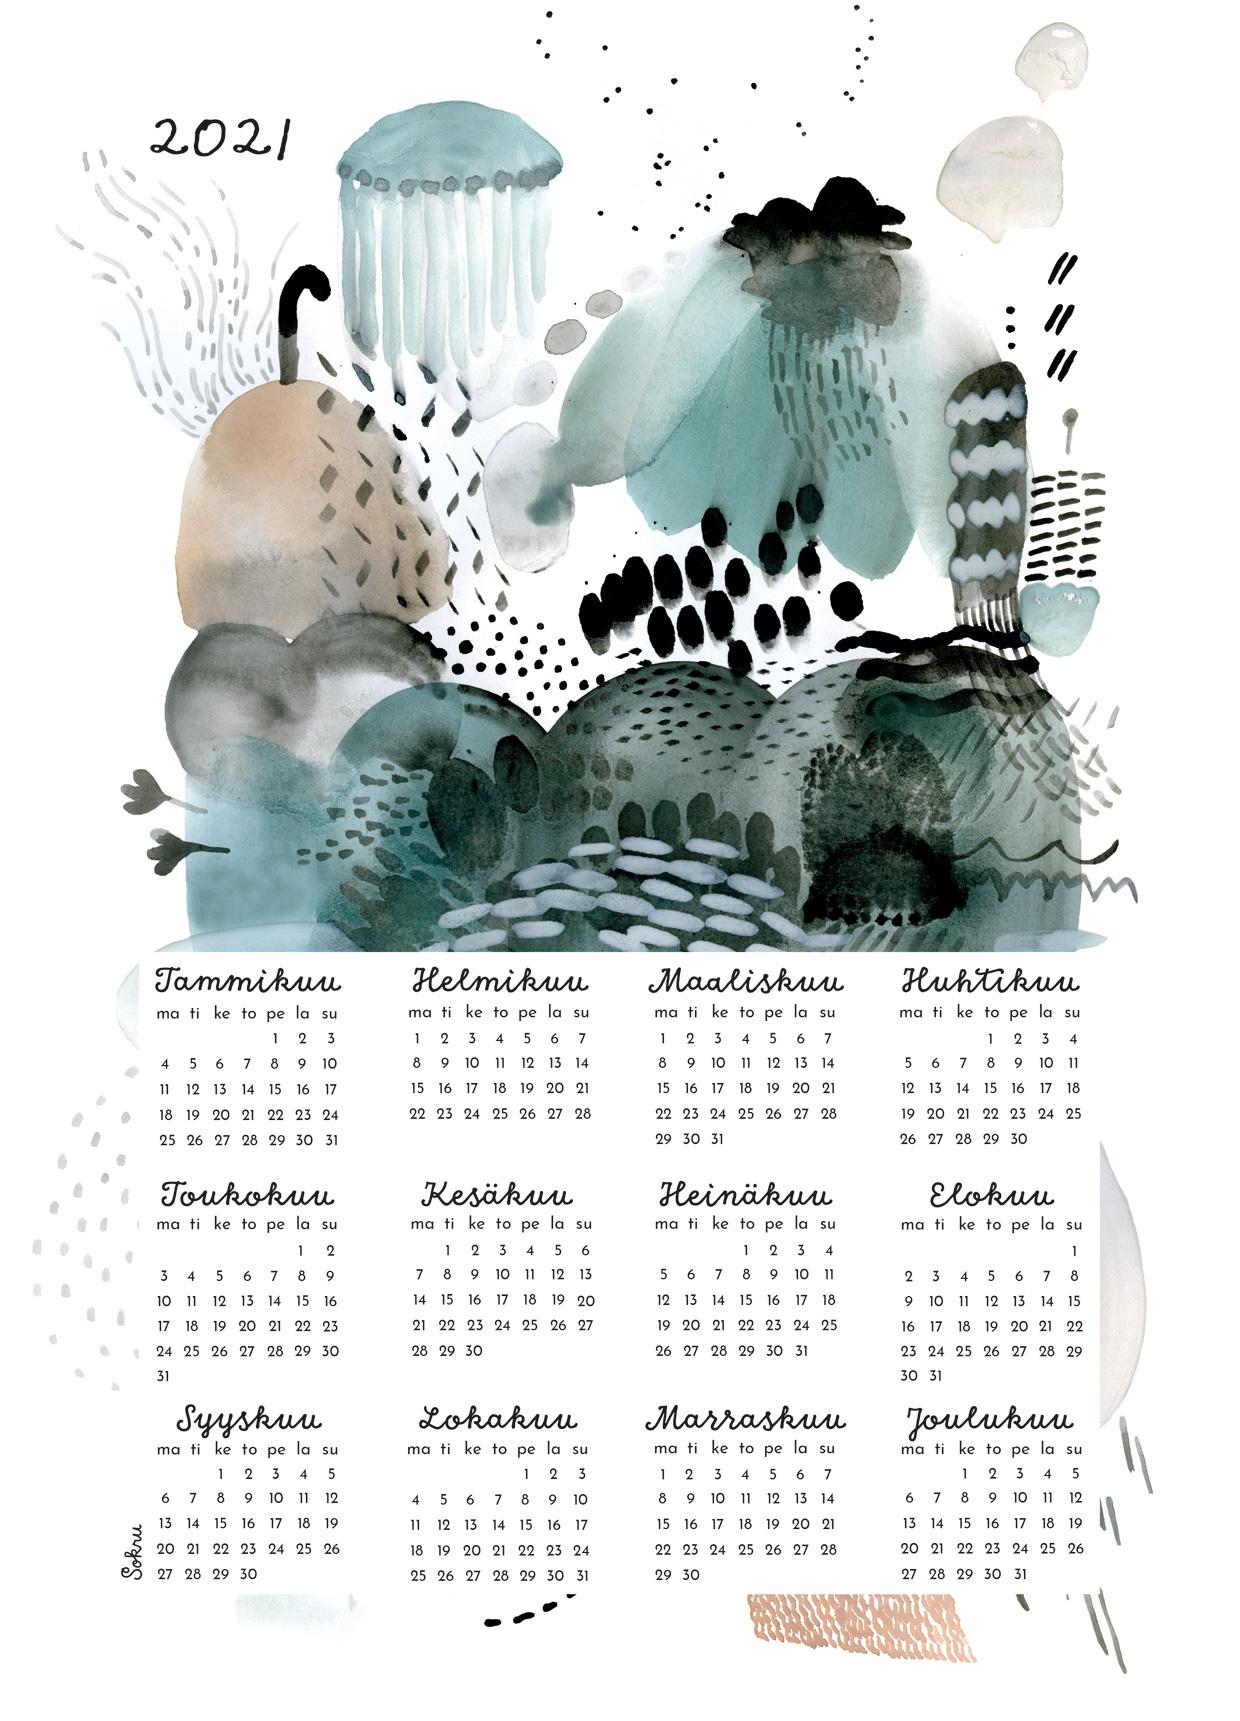 Sokru • Kalenterijuliste 50x70 Cm 2